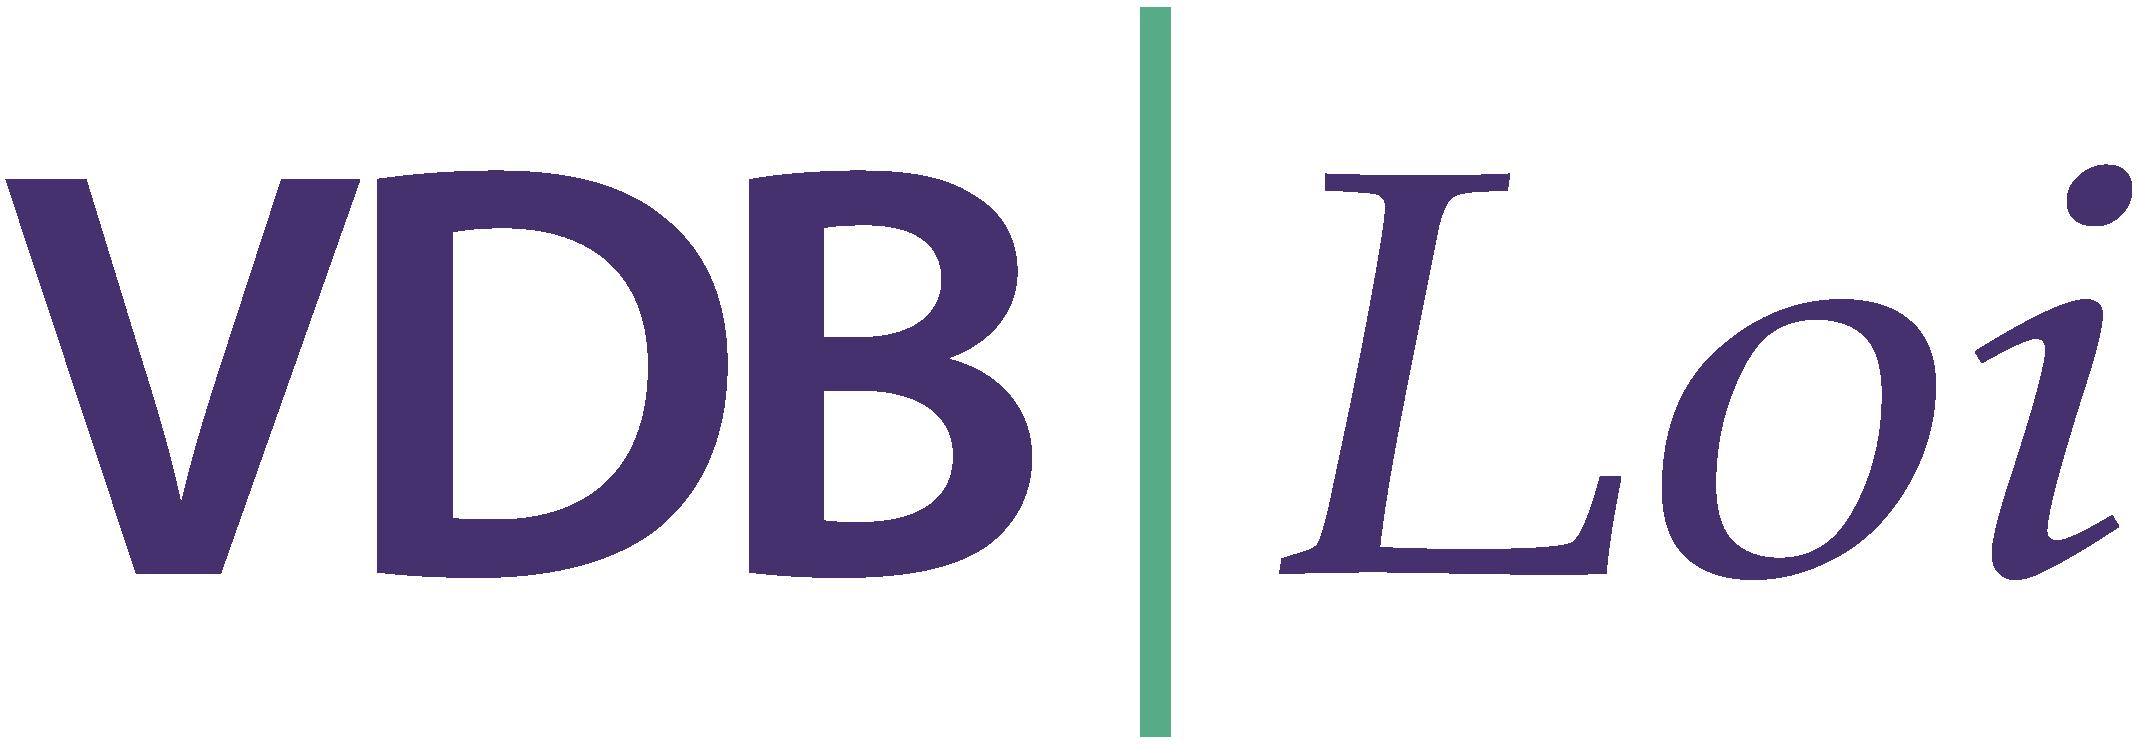 VDB Loi logo_2-03.png